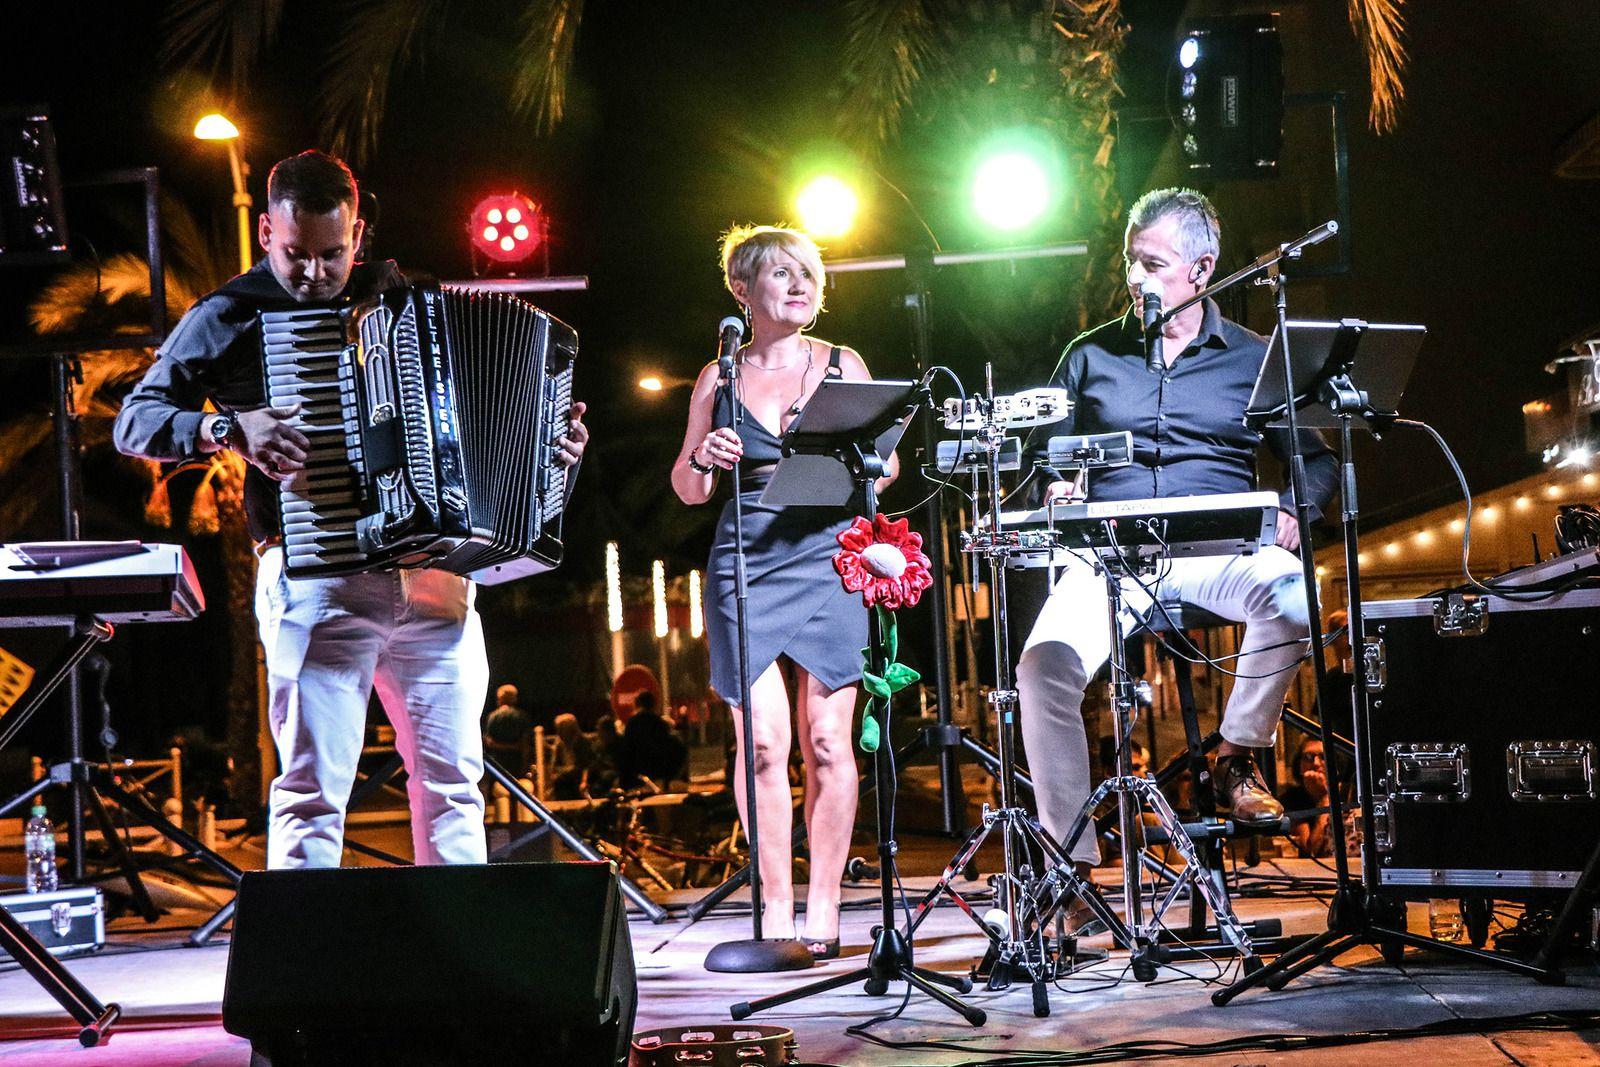 Groupe musical Hérault